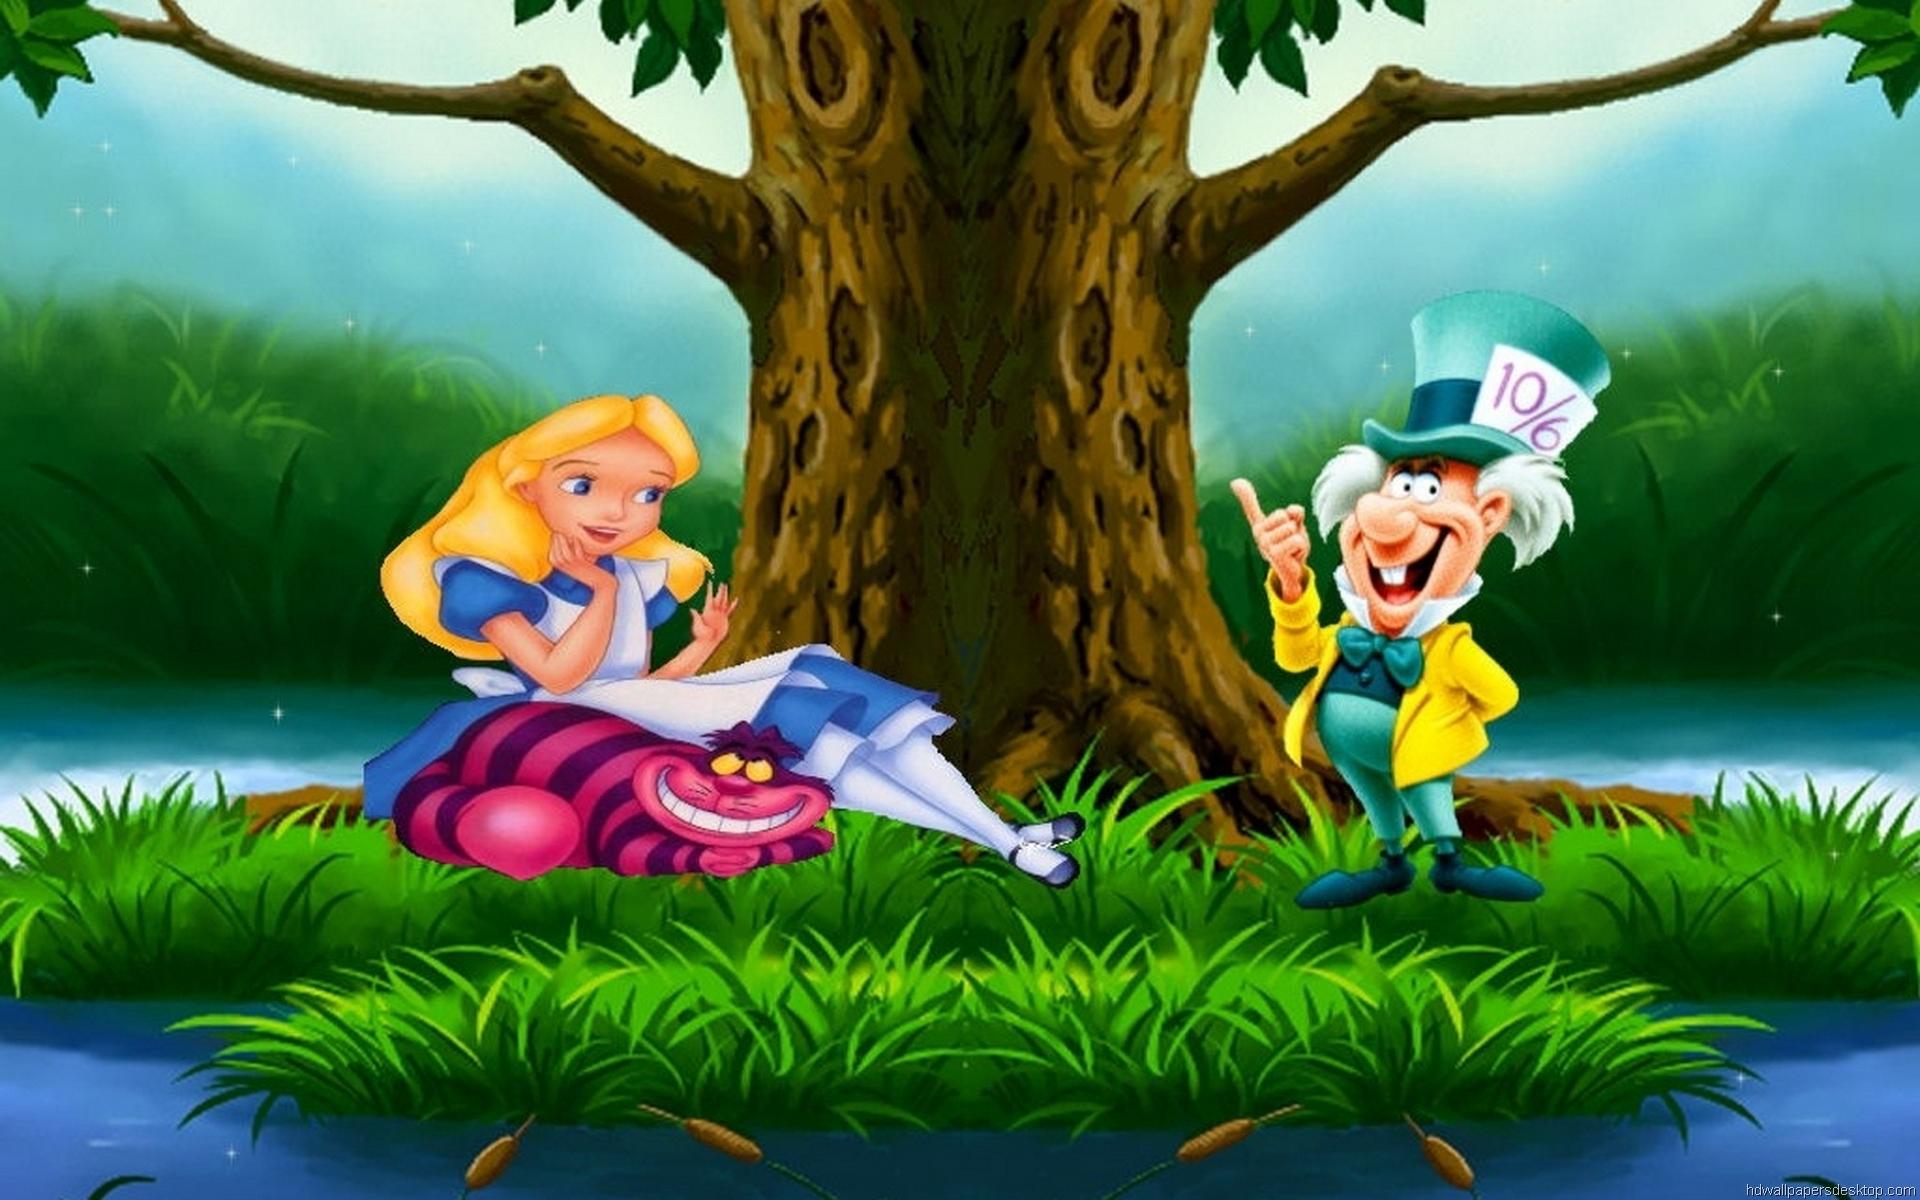 Wallpaper of cartoon characters wallpapersafari - Cartoon character wallpaper ...